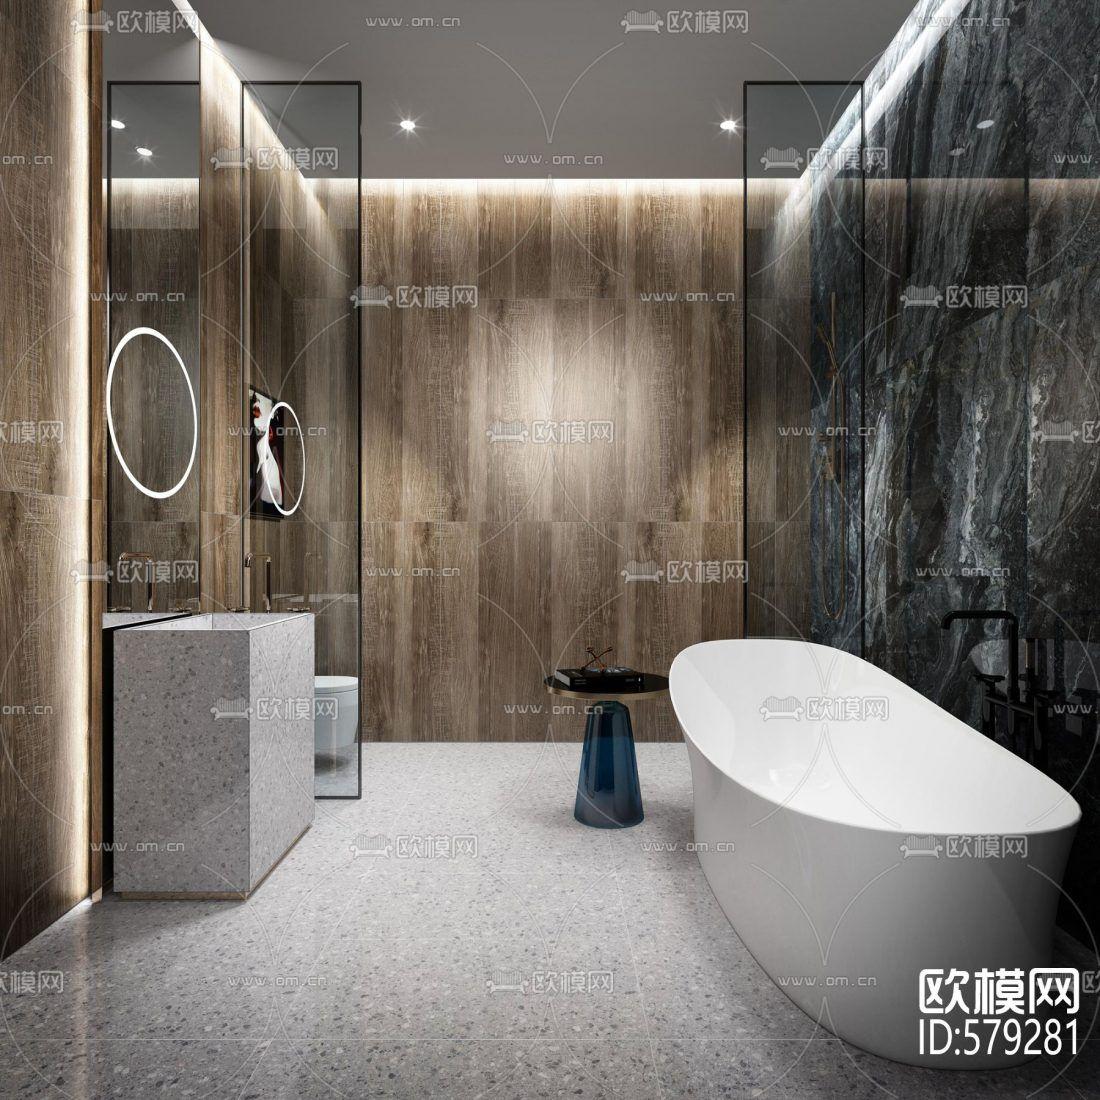 3d Models Bathroom Furniture 50 Free Download In 2020 Bathroom Model Bathroom Tile Designs Bathroom Furniture